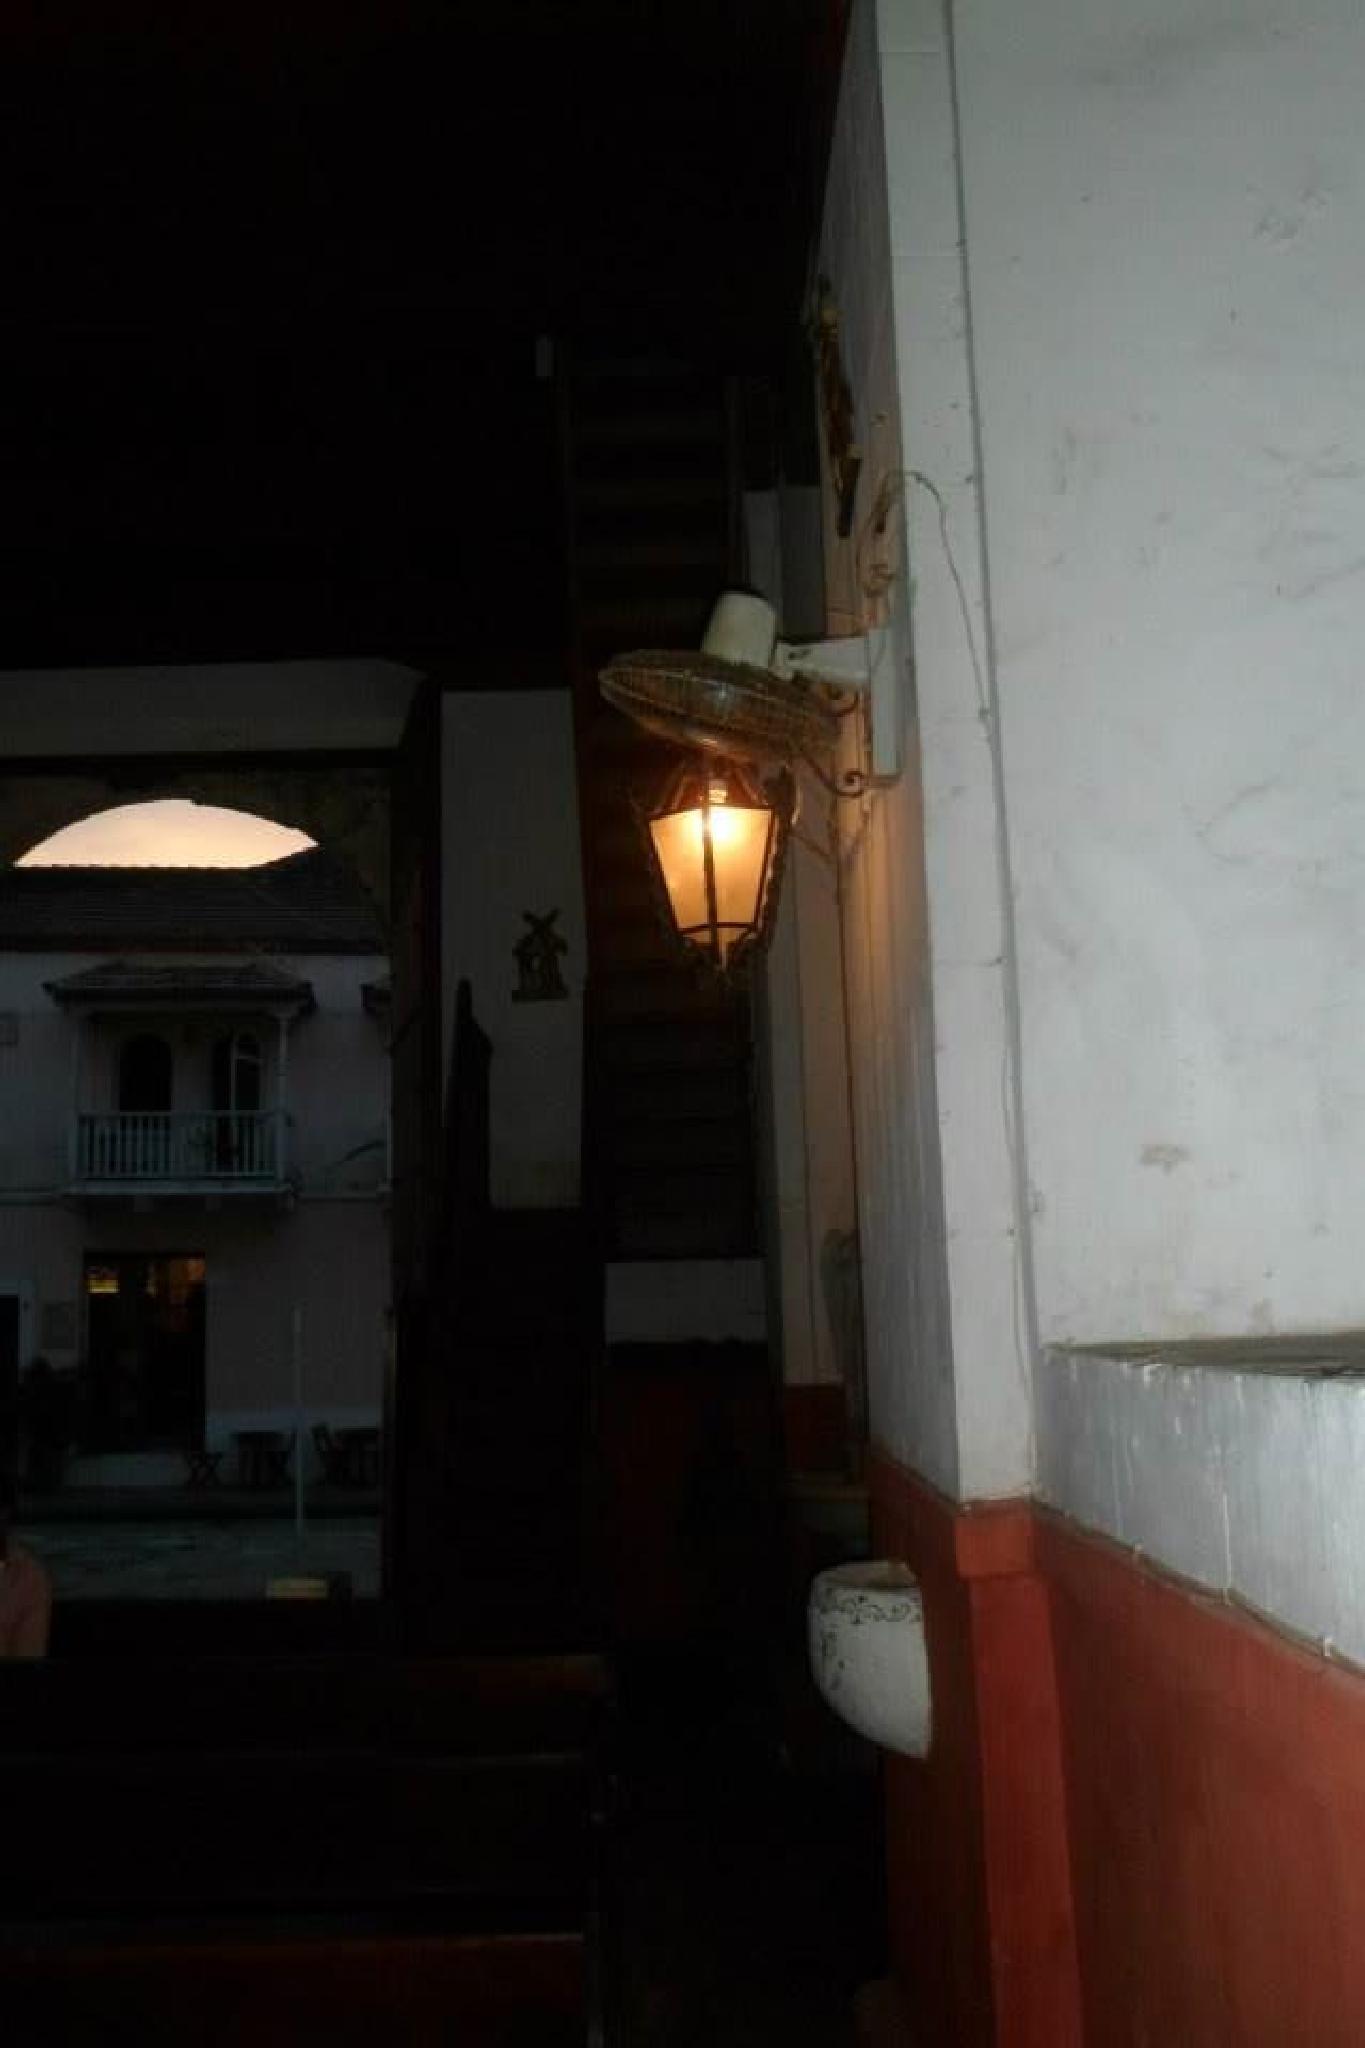 the wanderful lamp inside a church by castariza